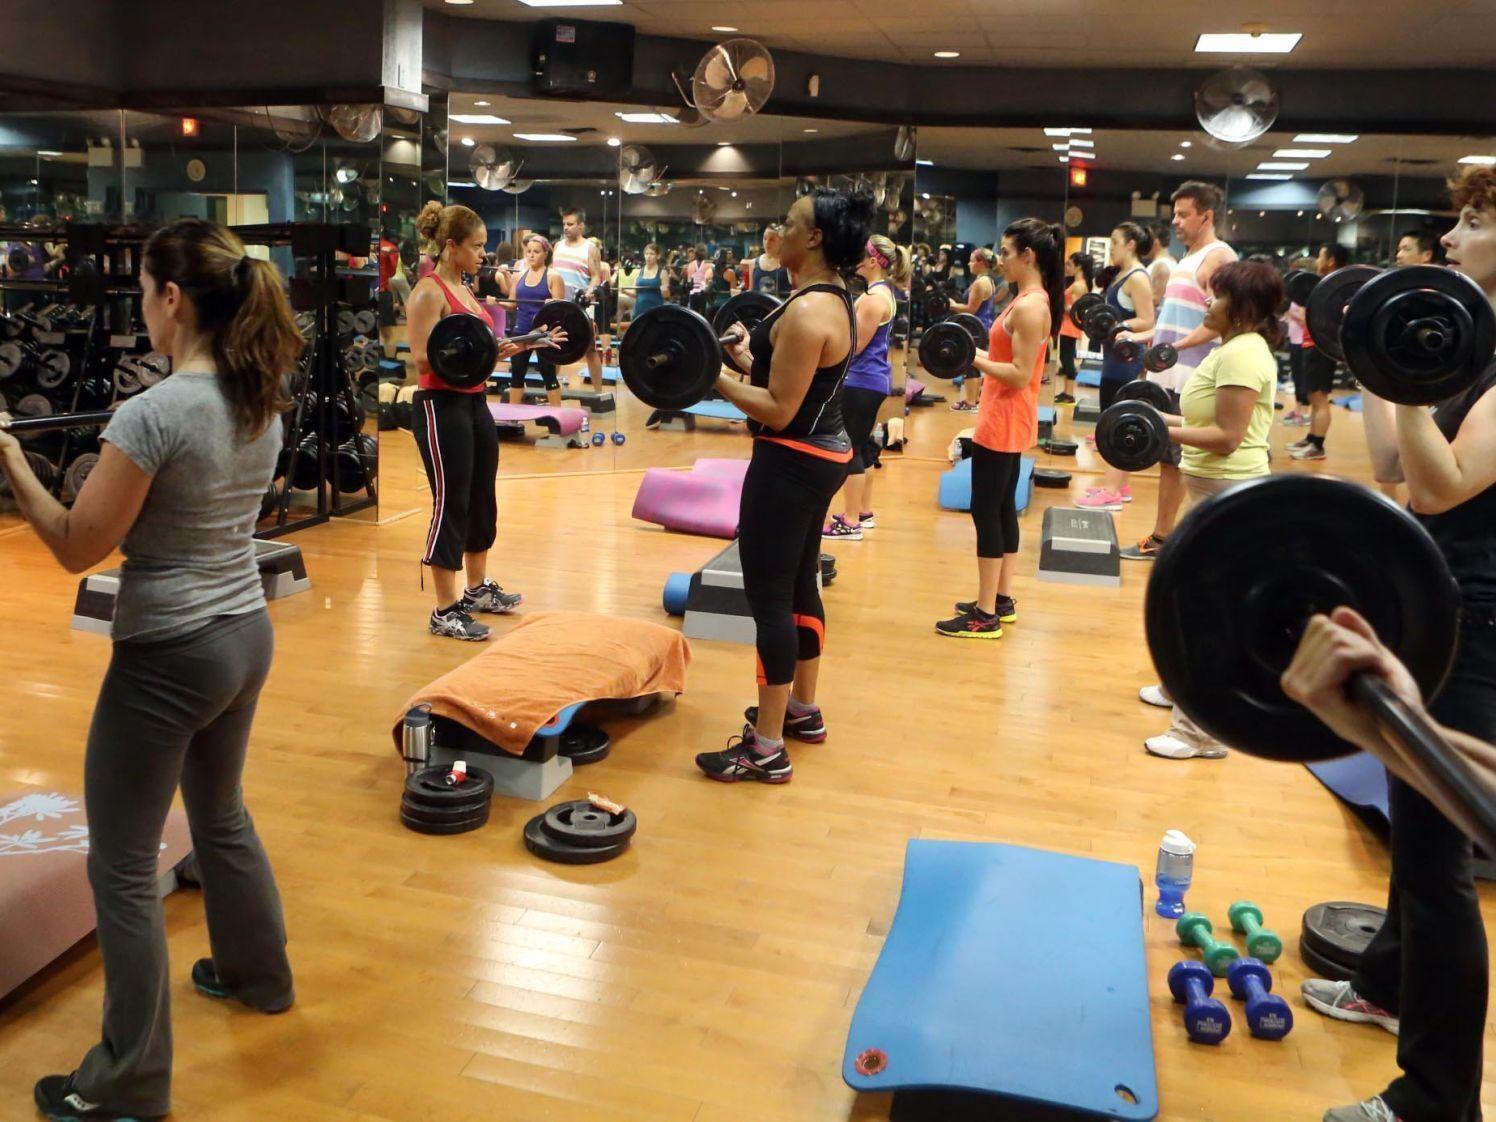 Looking For A Home Gym Tilton Fitness Is Auctioning Equipment Business Pressofatlanticcity Com